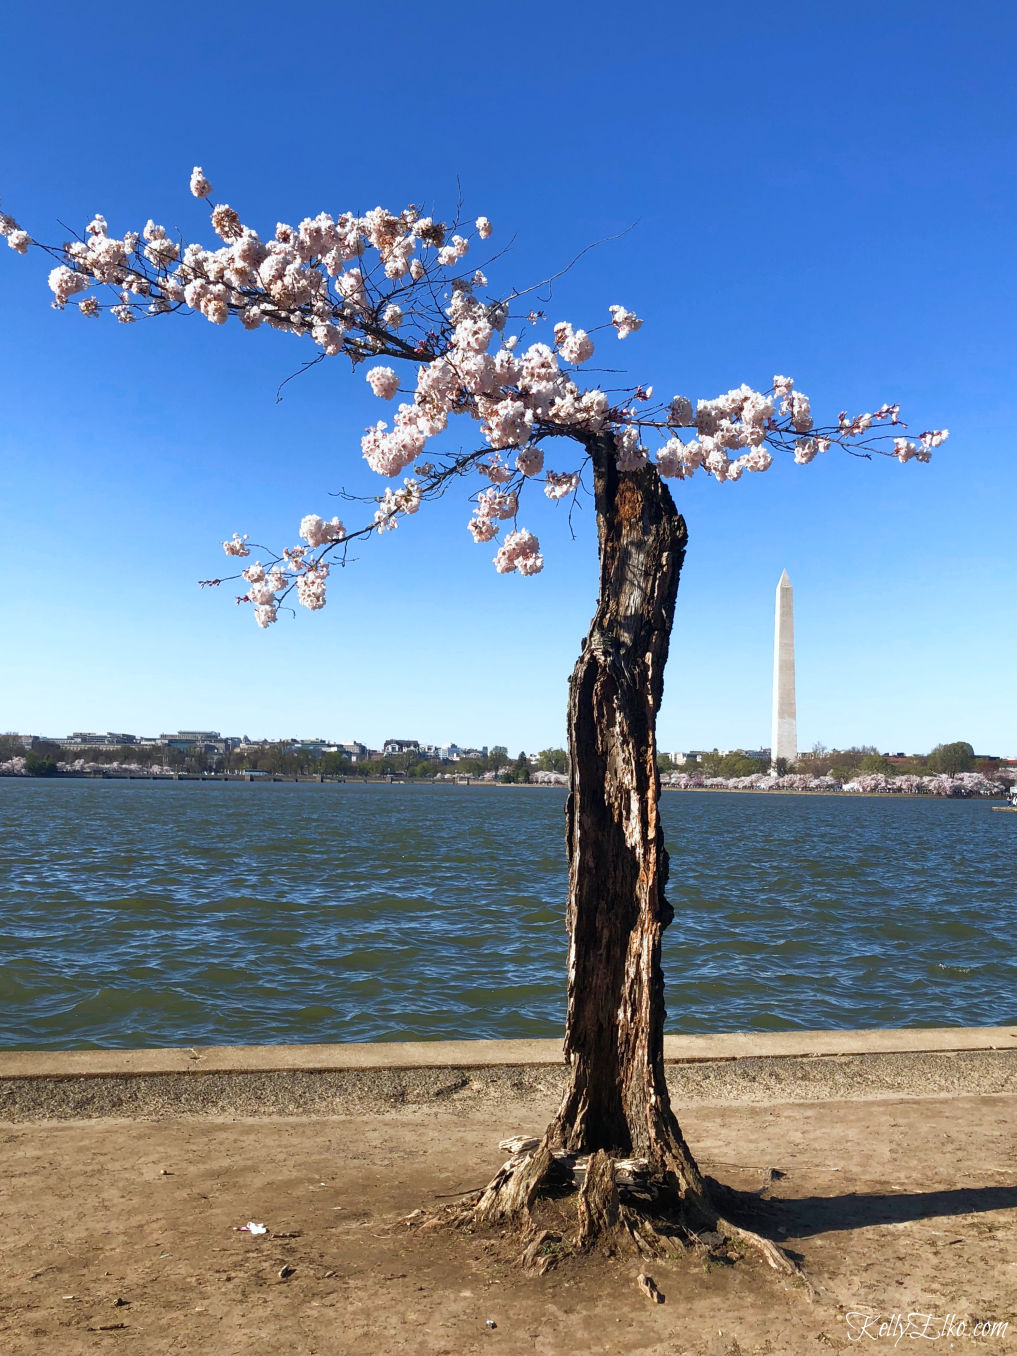 52 Weeks of Yes! Experience the Cherry Blossoms in Washington, DC kellyelko.com #cherryblossoms #washingtondc #52weeksofyes